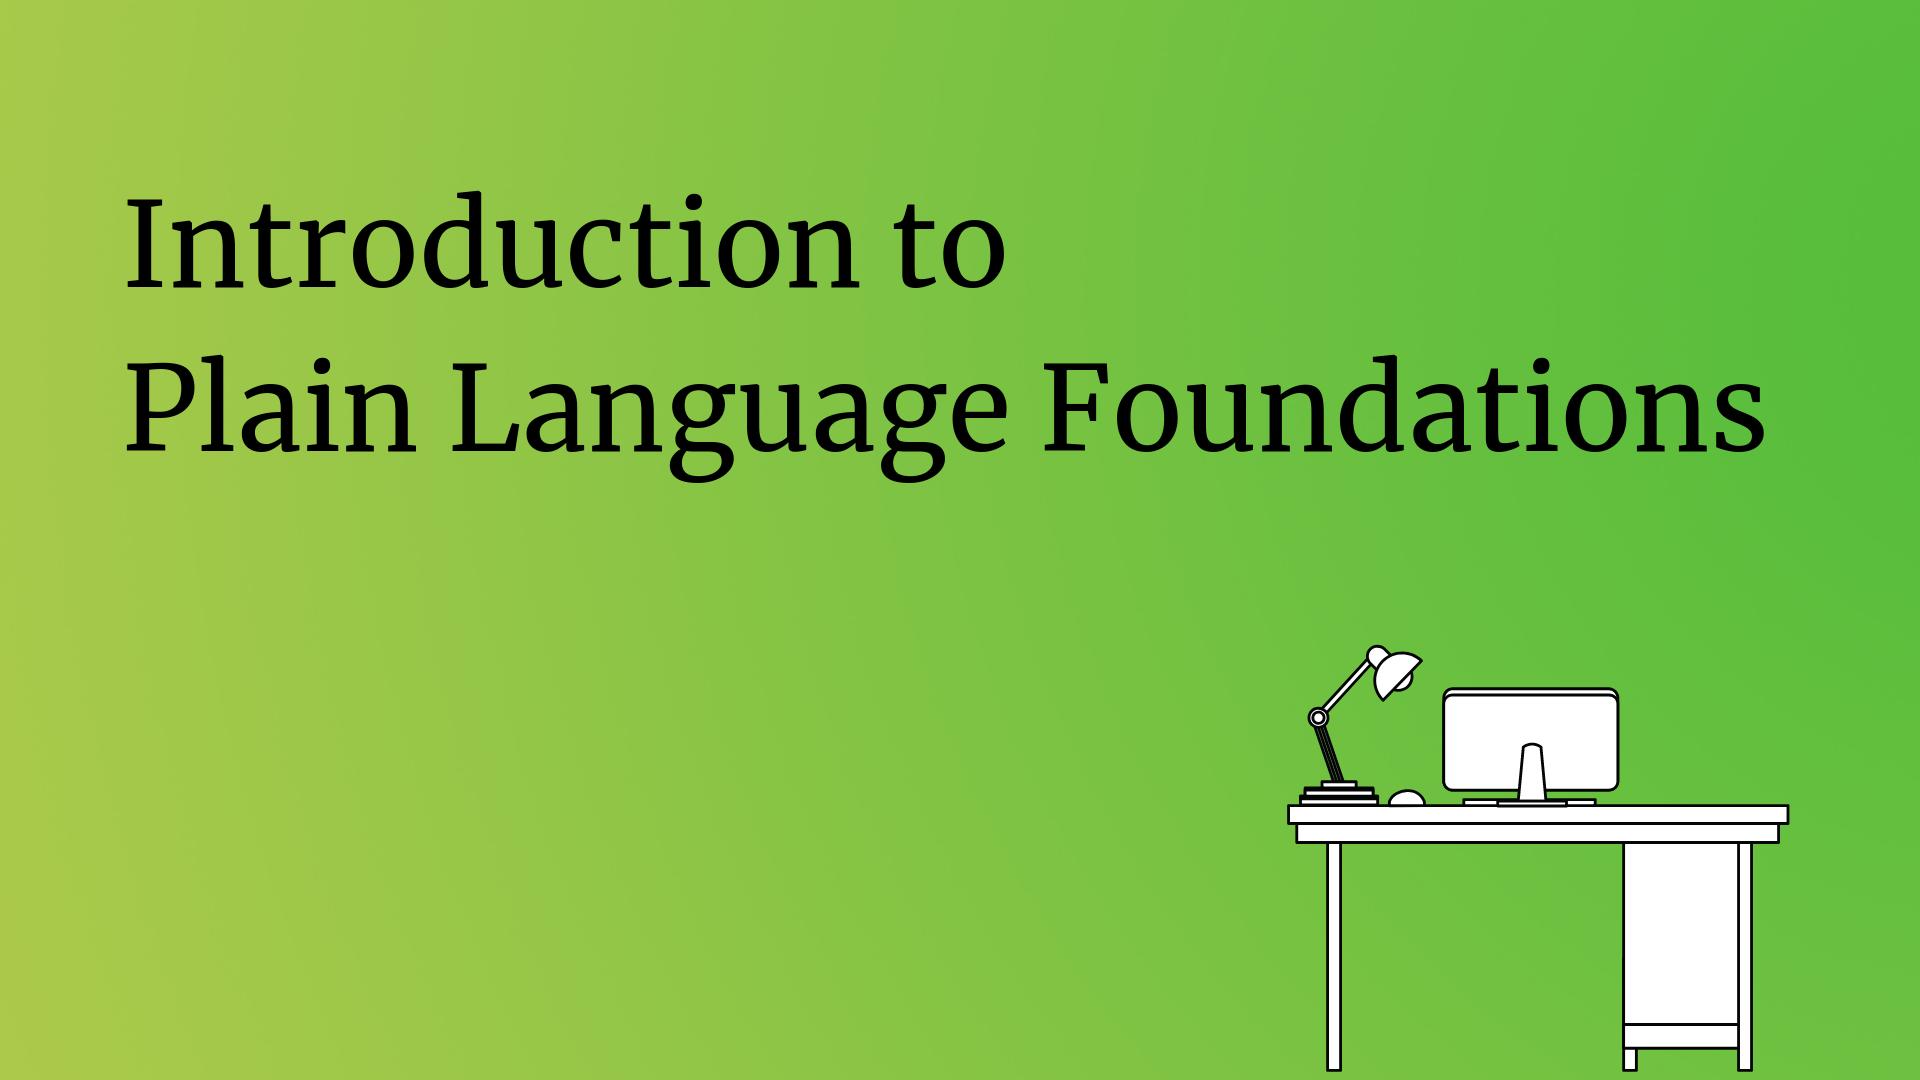 Introduction to Plain Language Foundations image